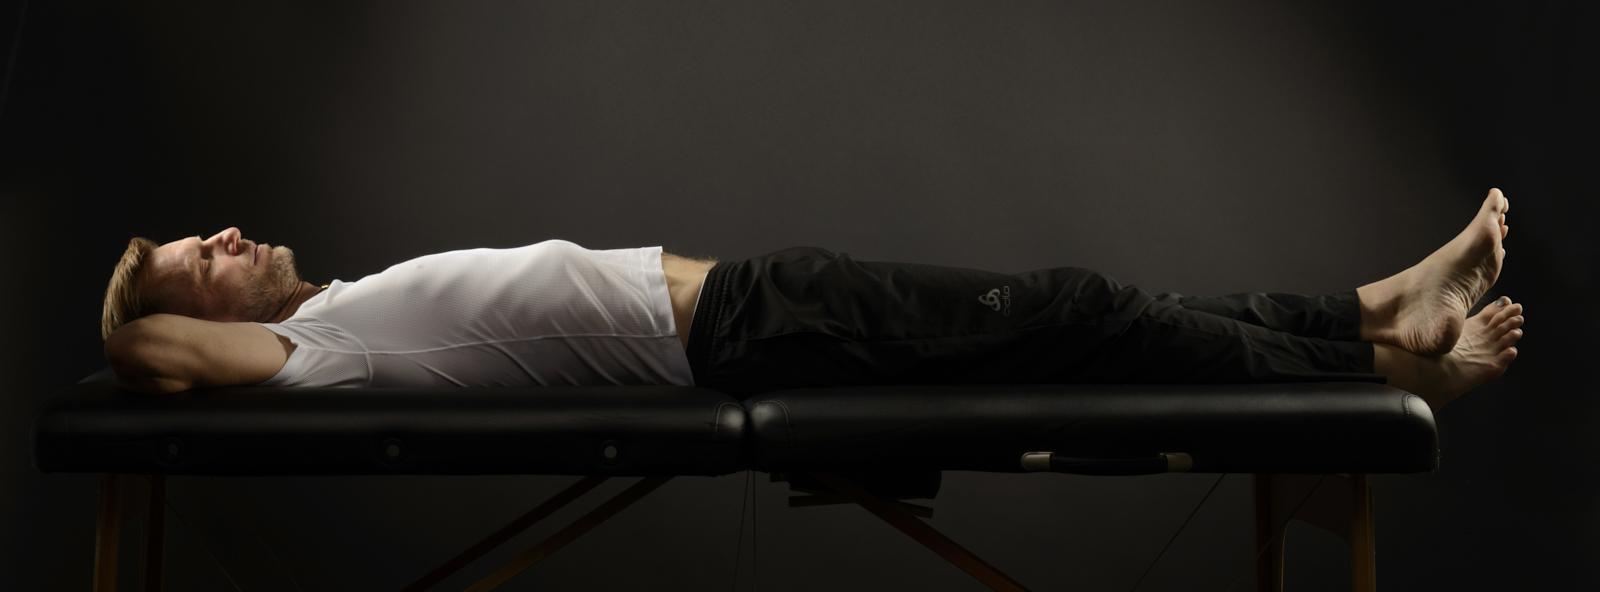 Massør Teddy Østerlin Koch startede MassageArt i 2014